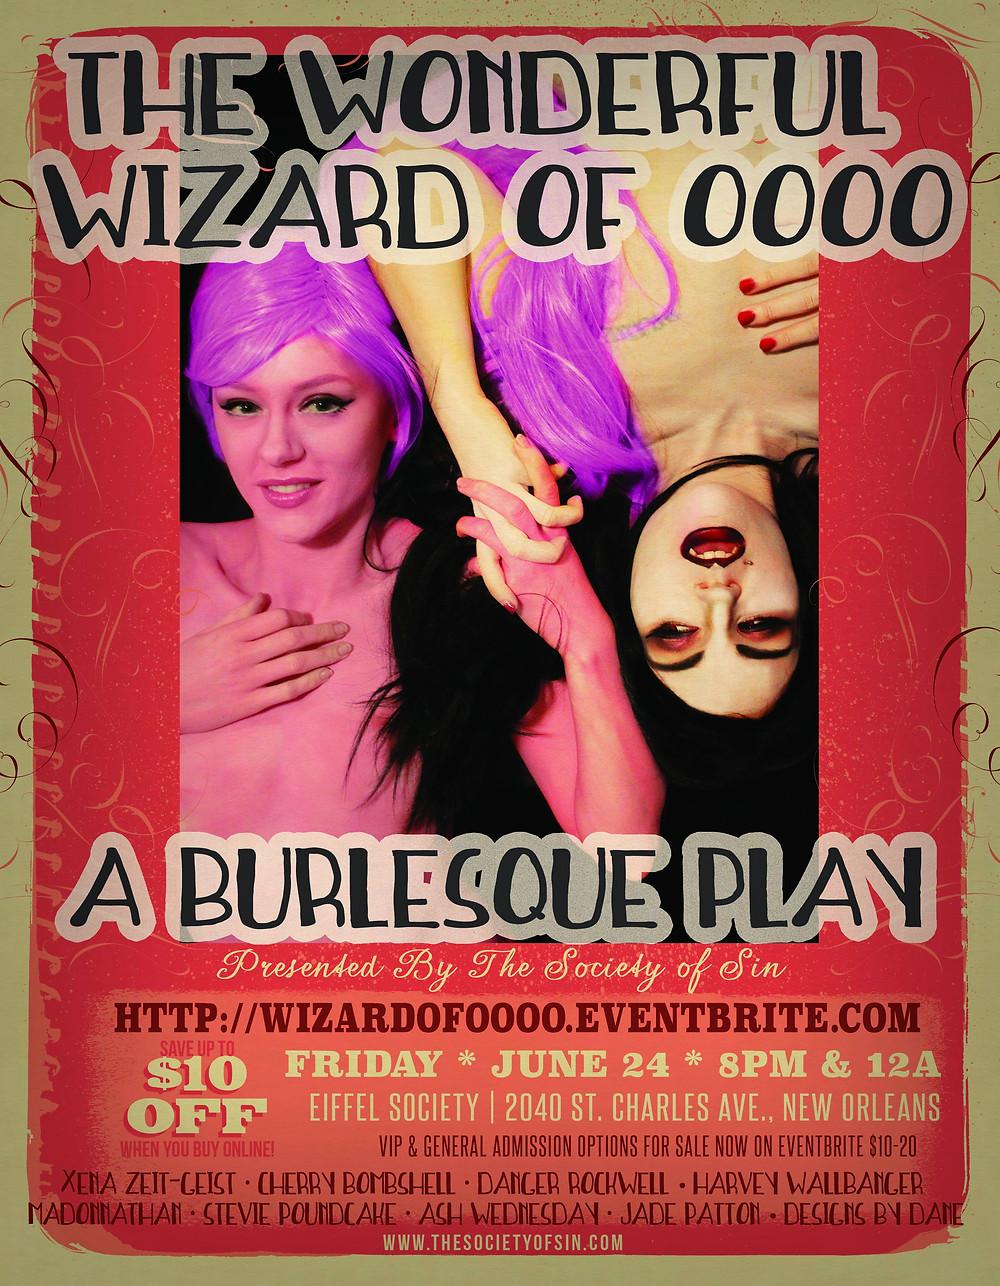 new orleans burlesque nerdlesque xena zeit-geist cherry bombshell